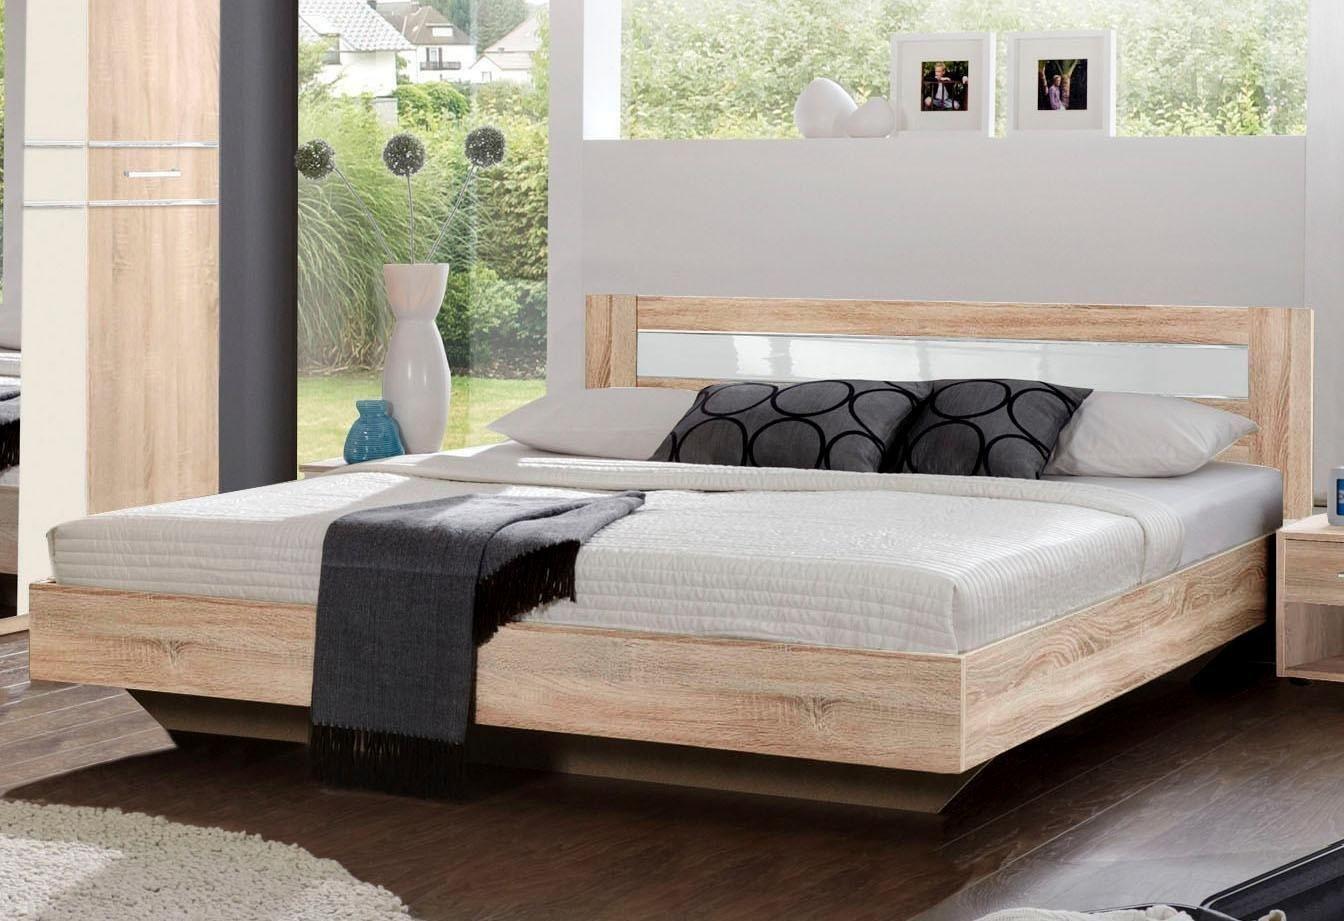 Wimex Bett Petrapamela Betten In 2019 Bett Bett